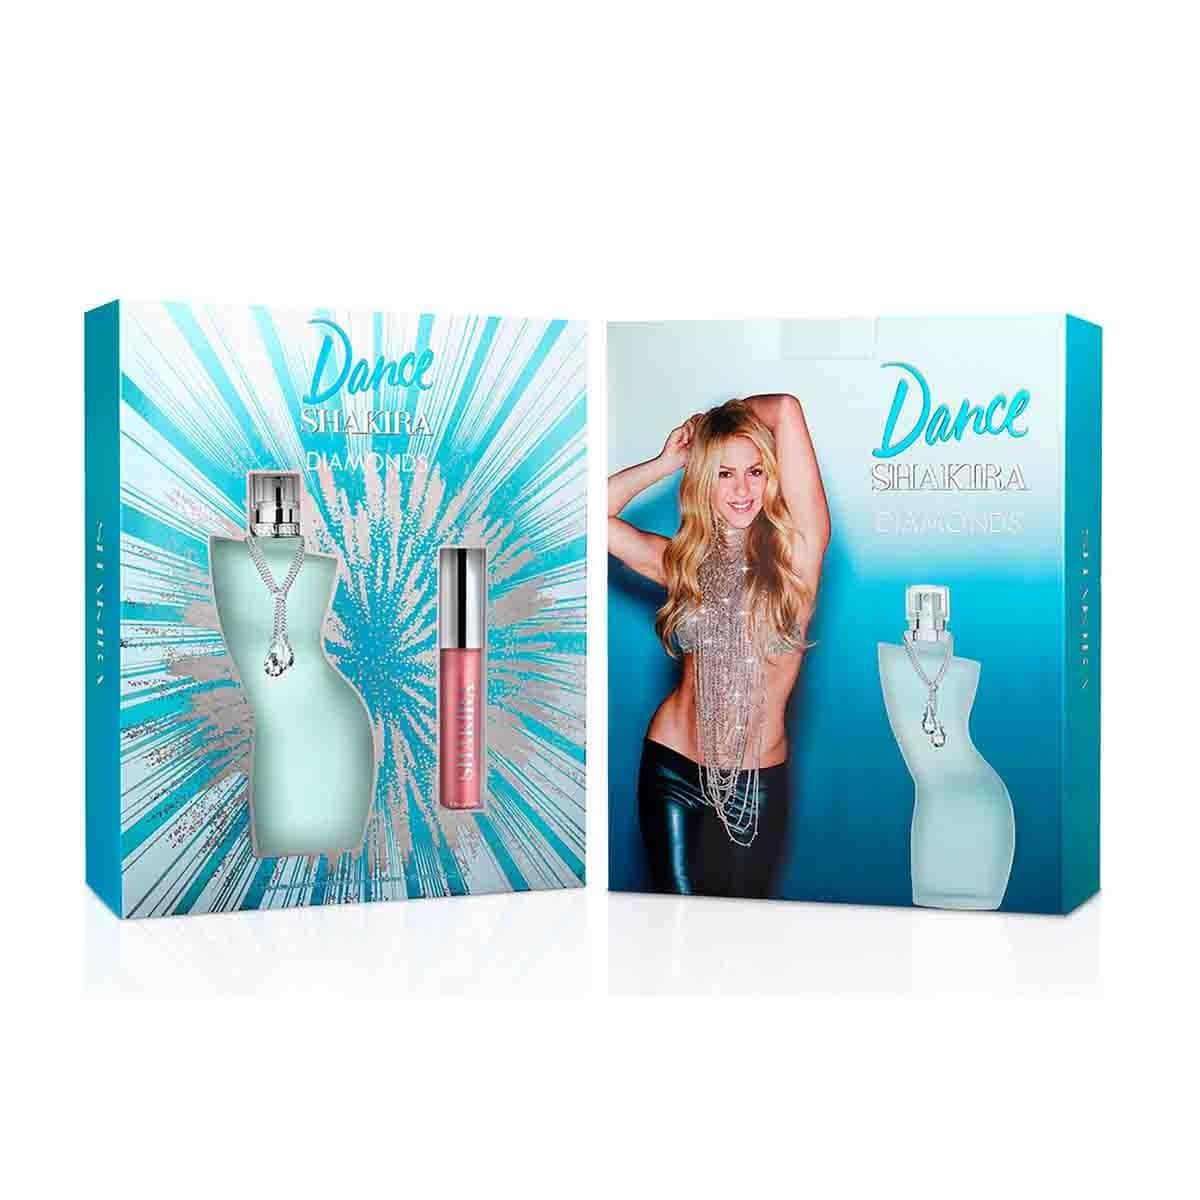 Estuche para Dama Shakira Dance Diamonds Edt 80 Ml + Lip Gloss